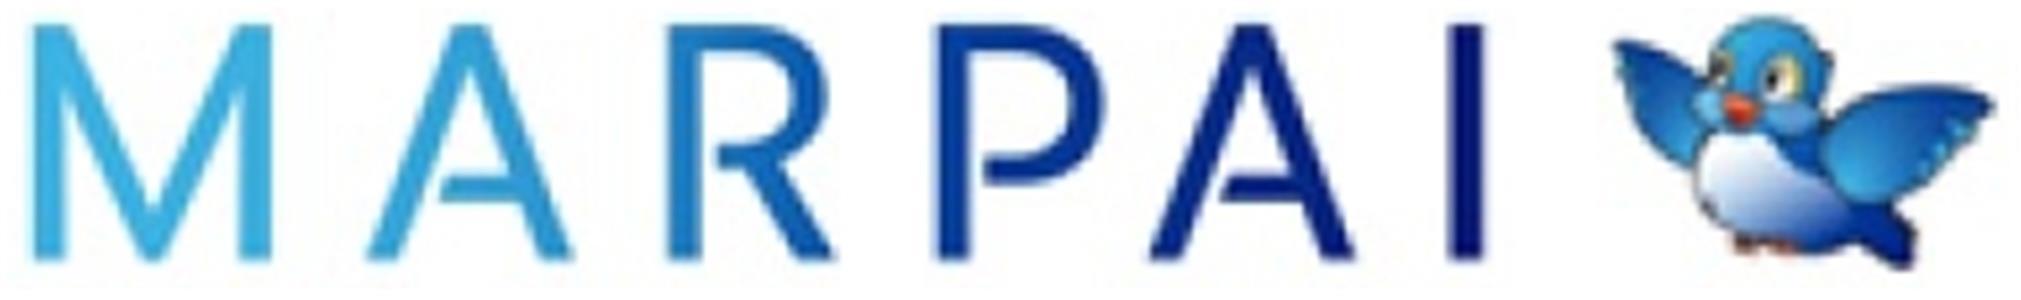 MRAI logo